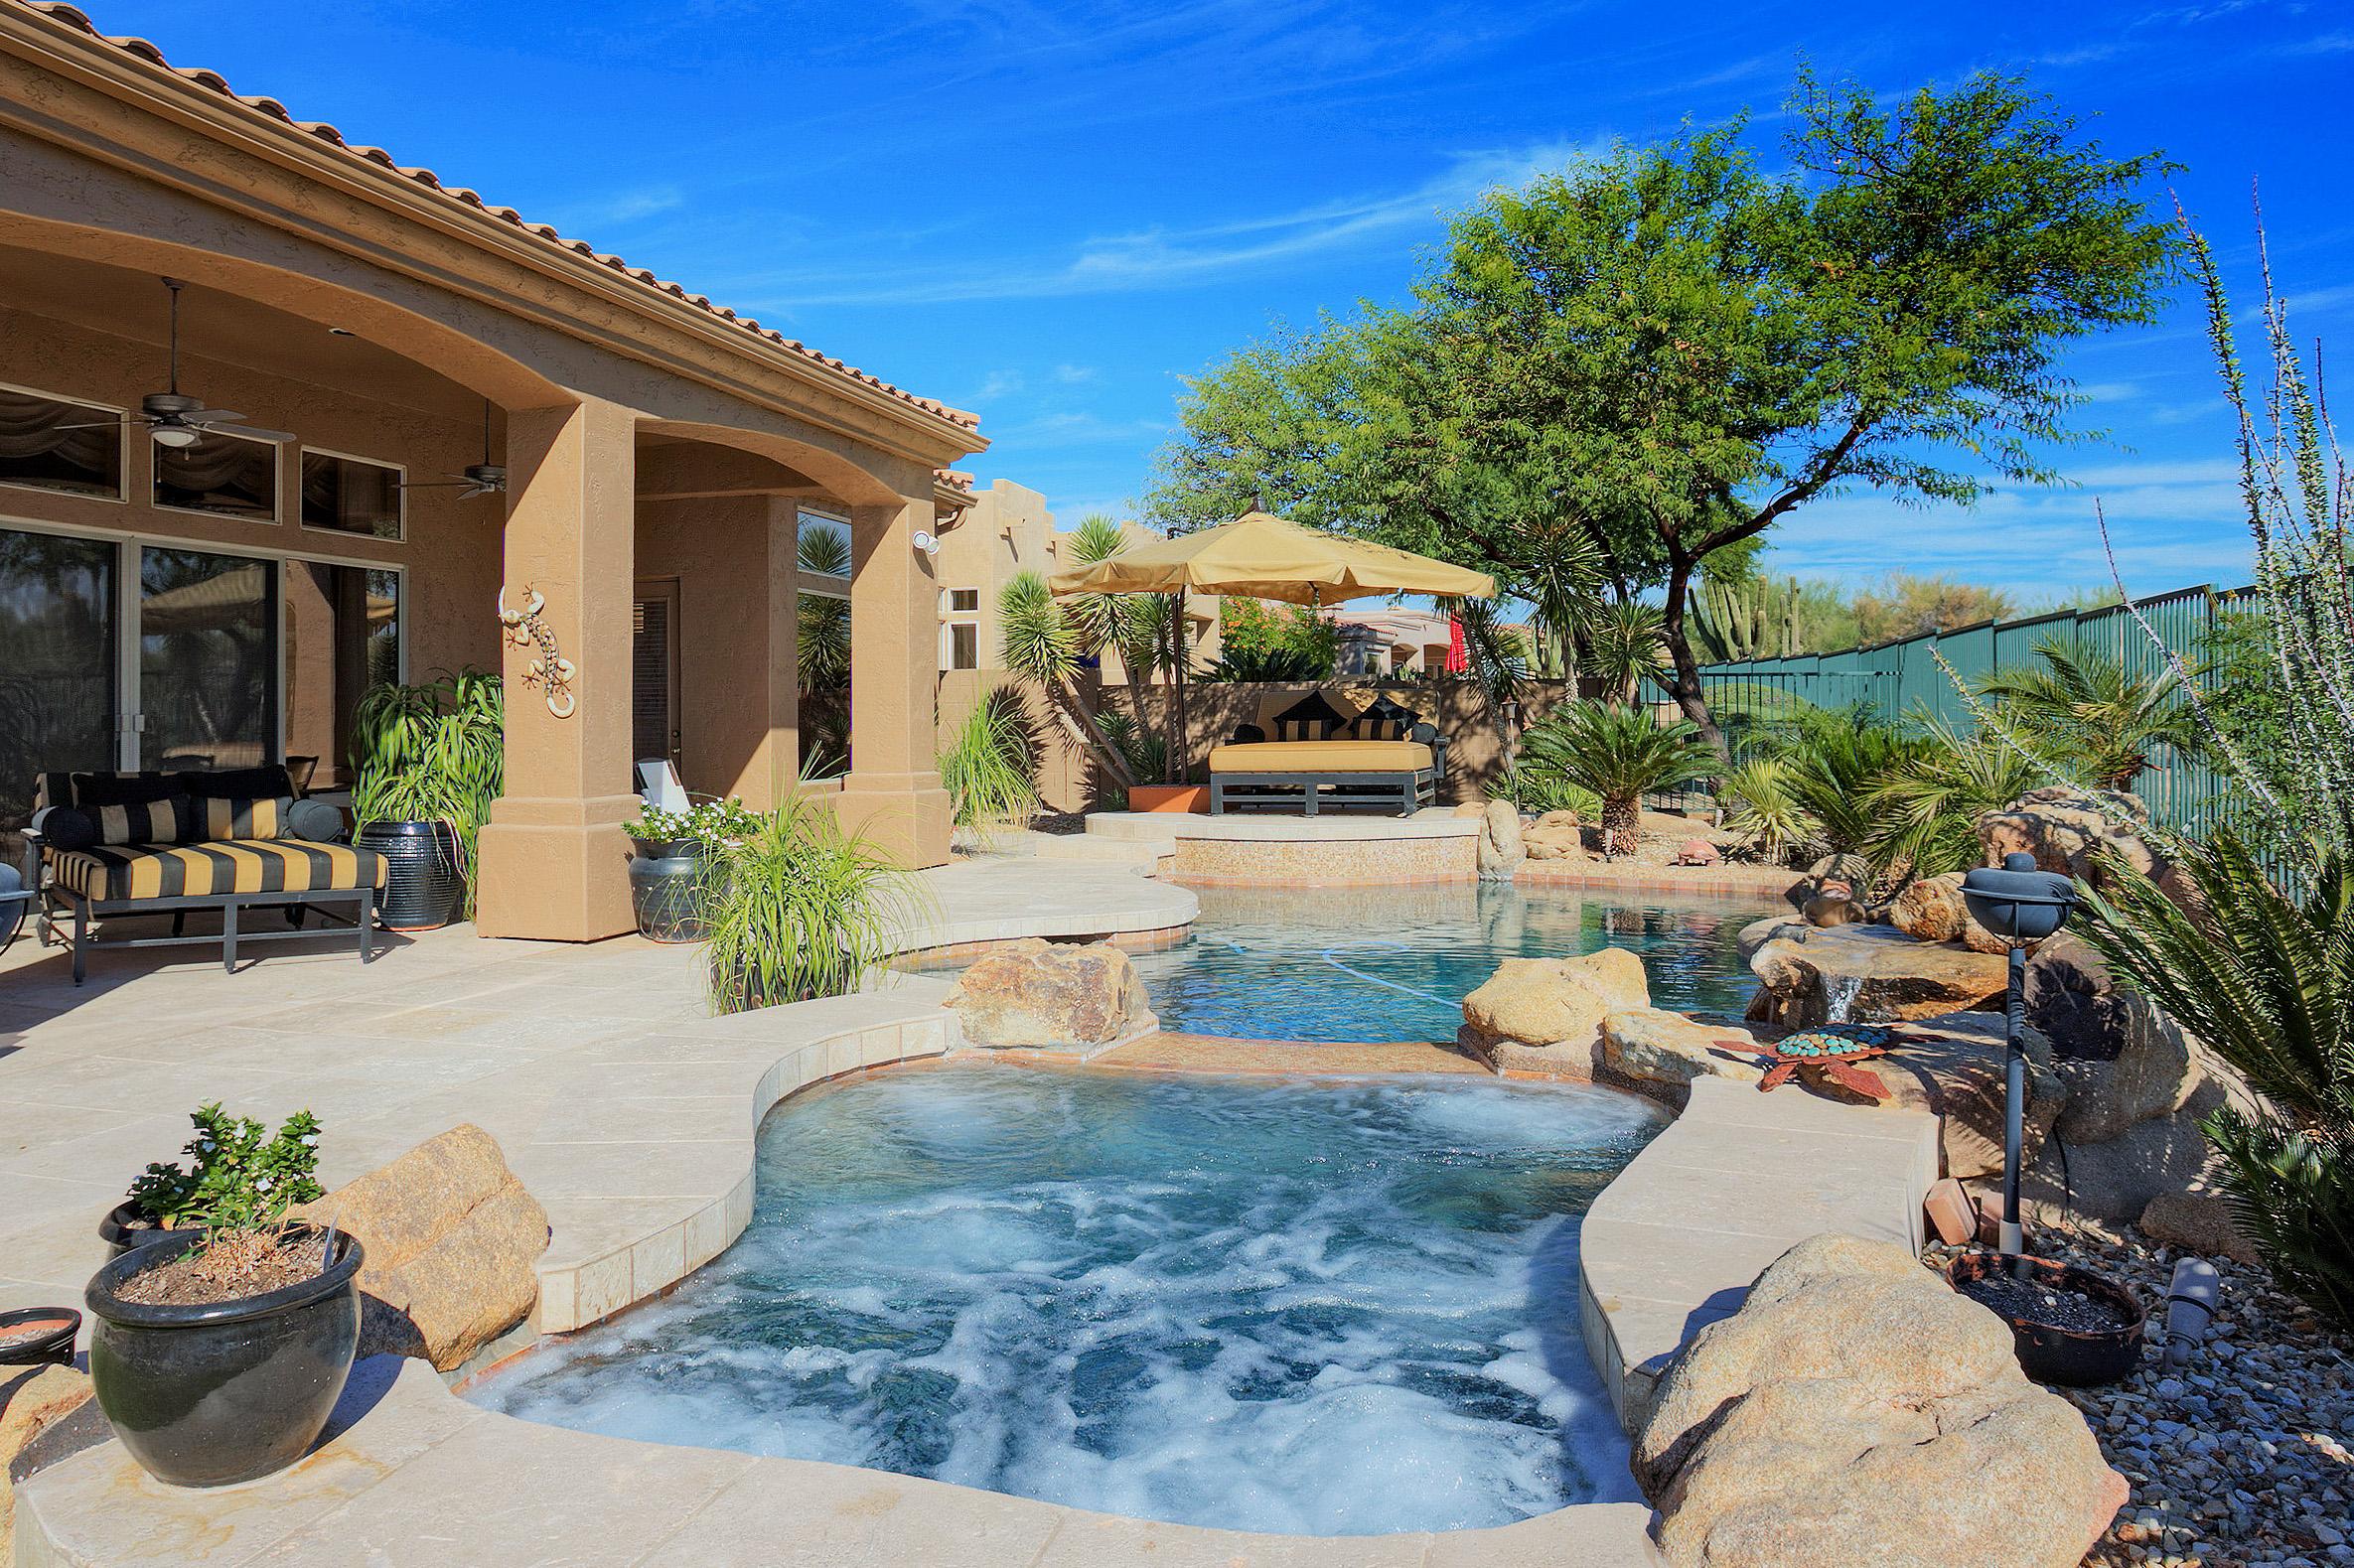 Scottsdale AZ Vacation Rental Welcome to Scottsdale!